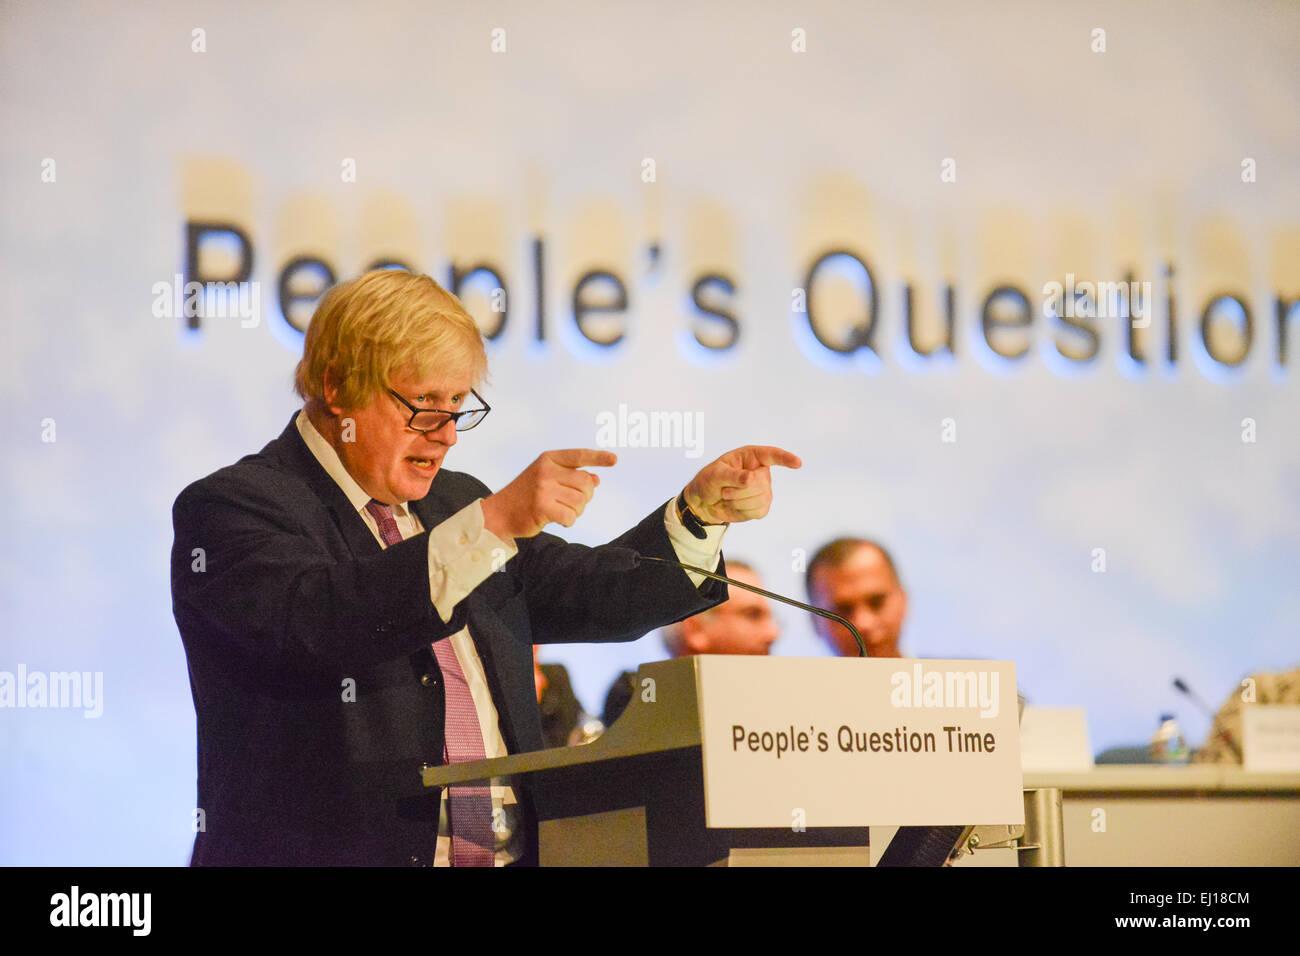 Wood Green, Haringey, London, UK. 19th March 2015. London Mayor Boris Johnson and the London Assembly take part - Stock Image